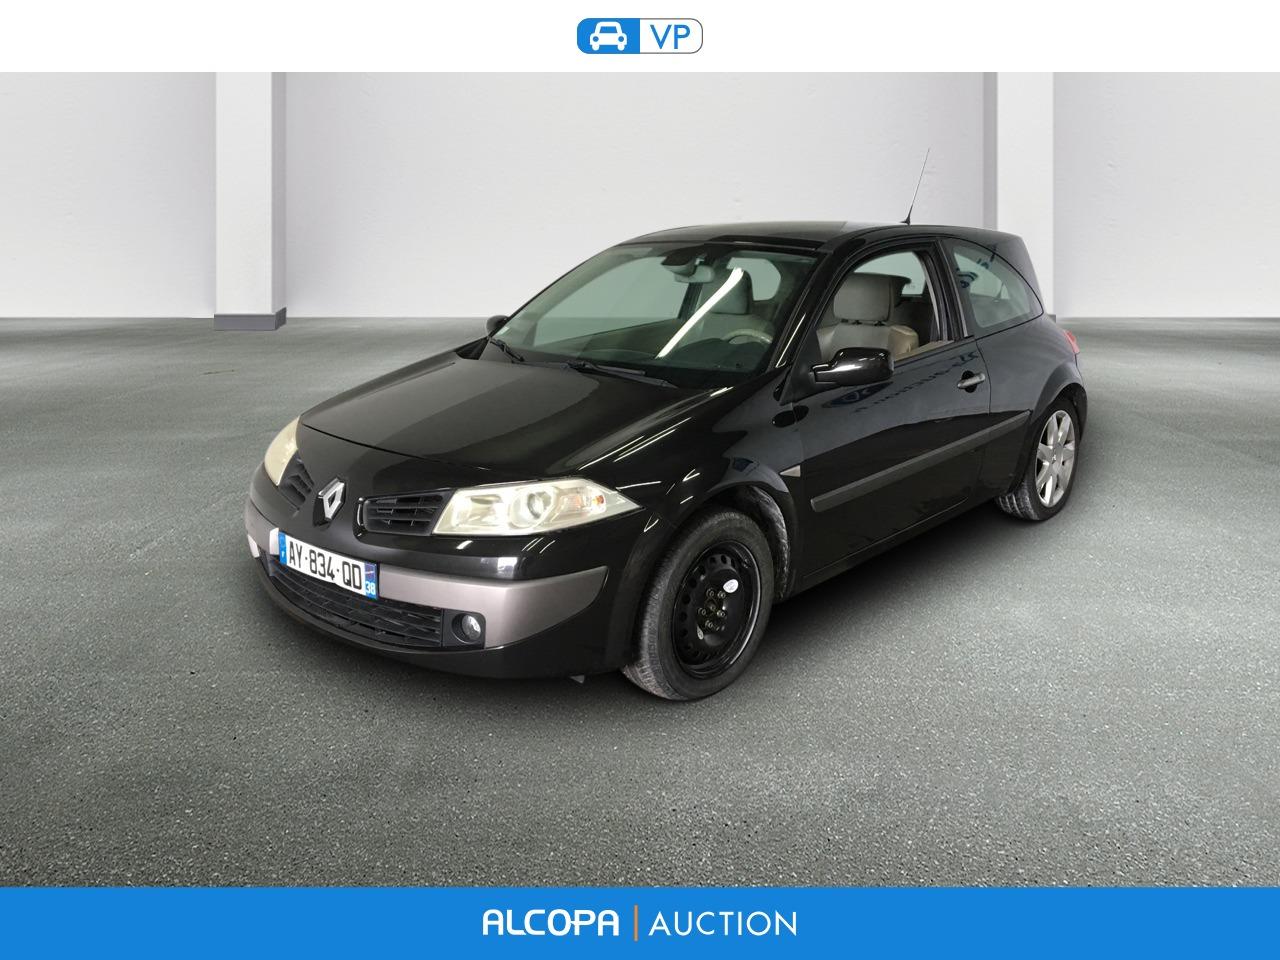 Renault Megane Ii Coupe 12 2005 04 2009 Megane Ii Coupe 2 0 Dci 150 Alcopa Auction